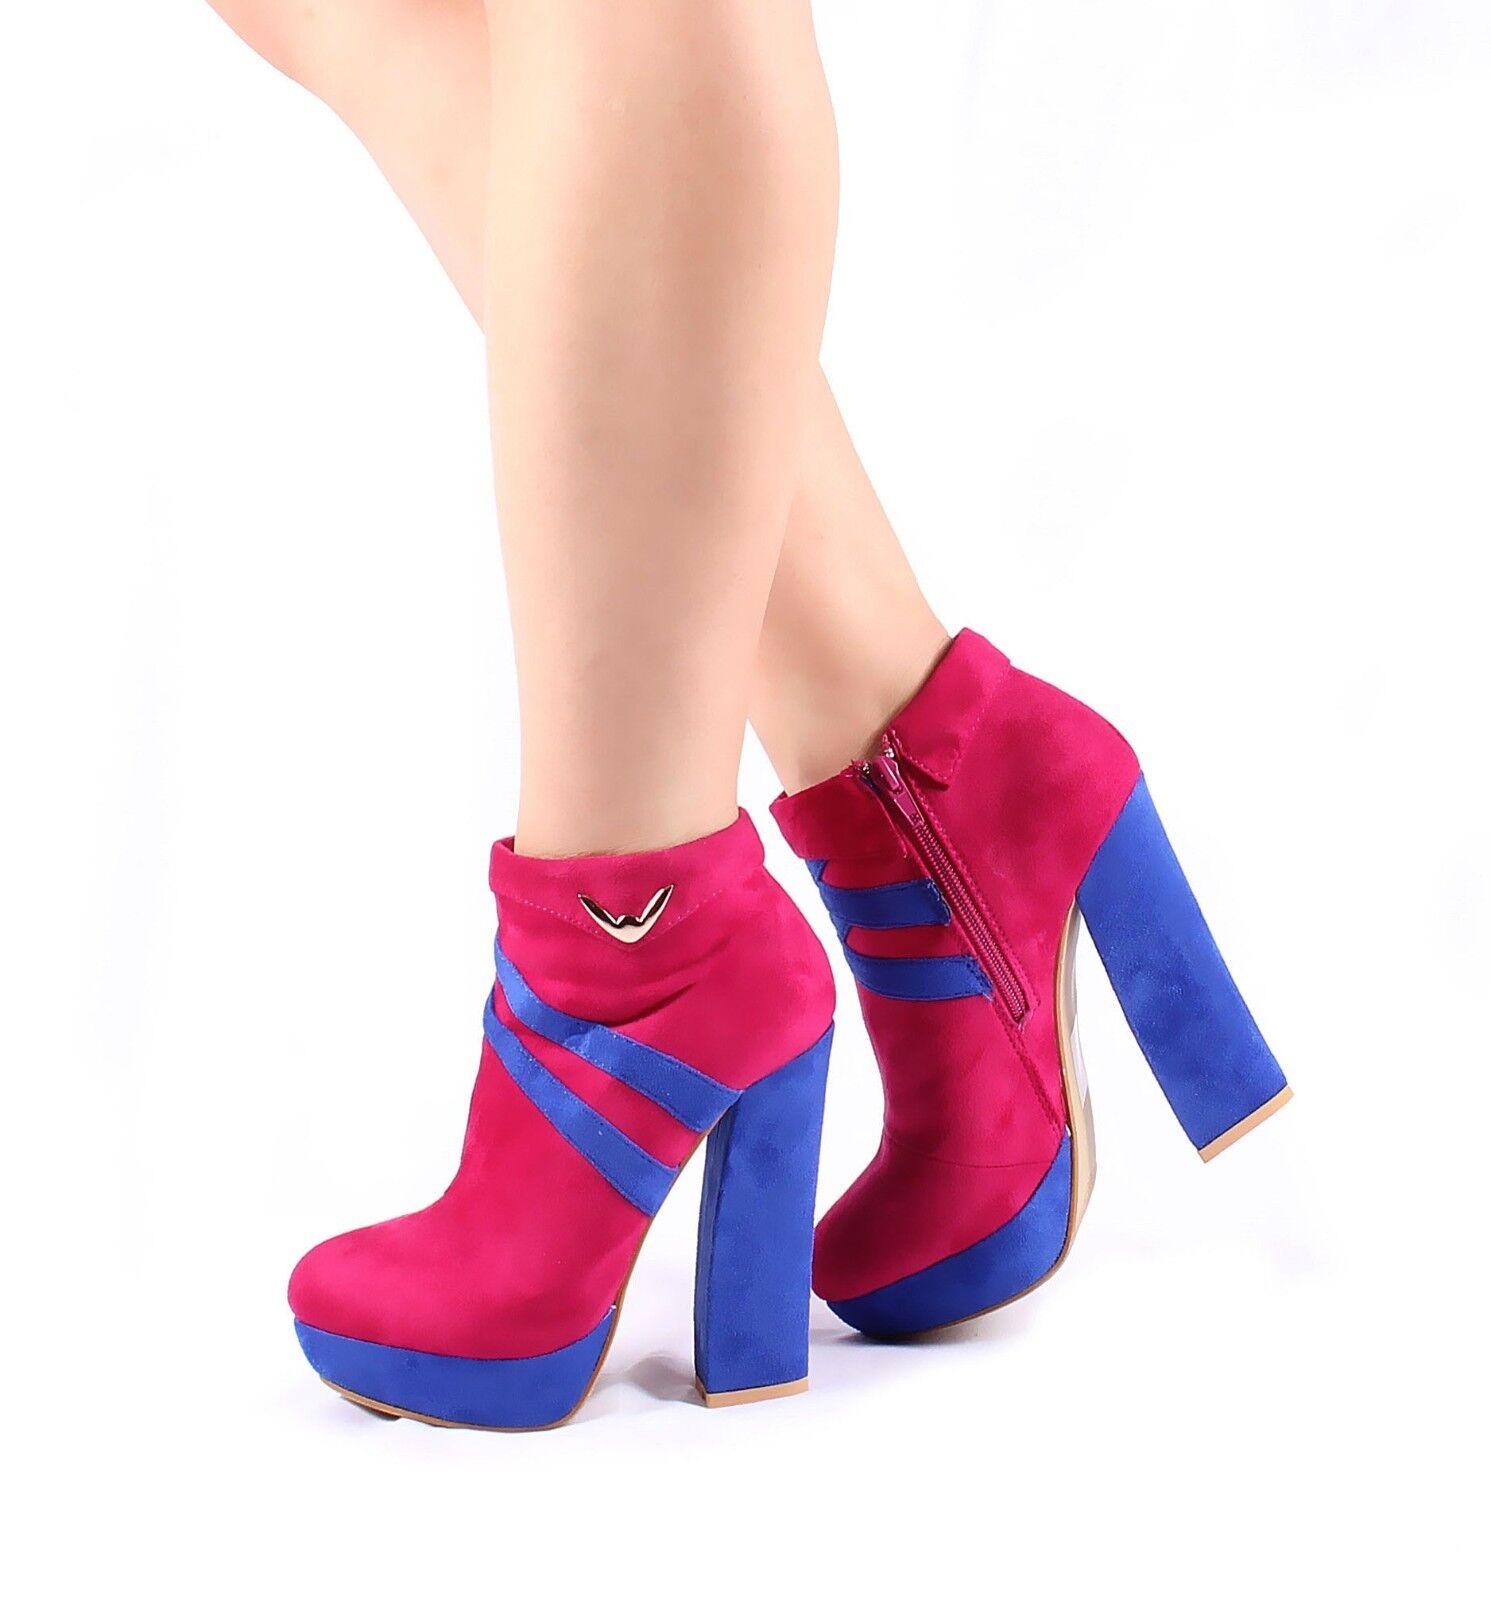 "Fuchsia Ankle Boot Pump Prom Stilettos Platform Womens 5"" Heel Shoes Sz 7.5"